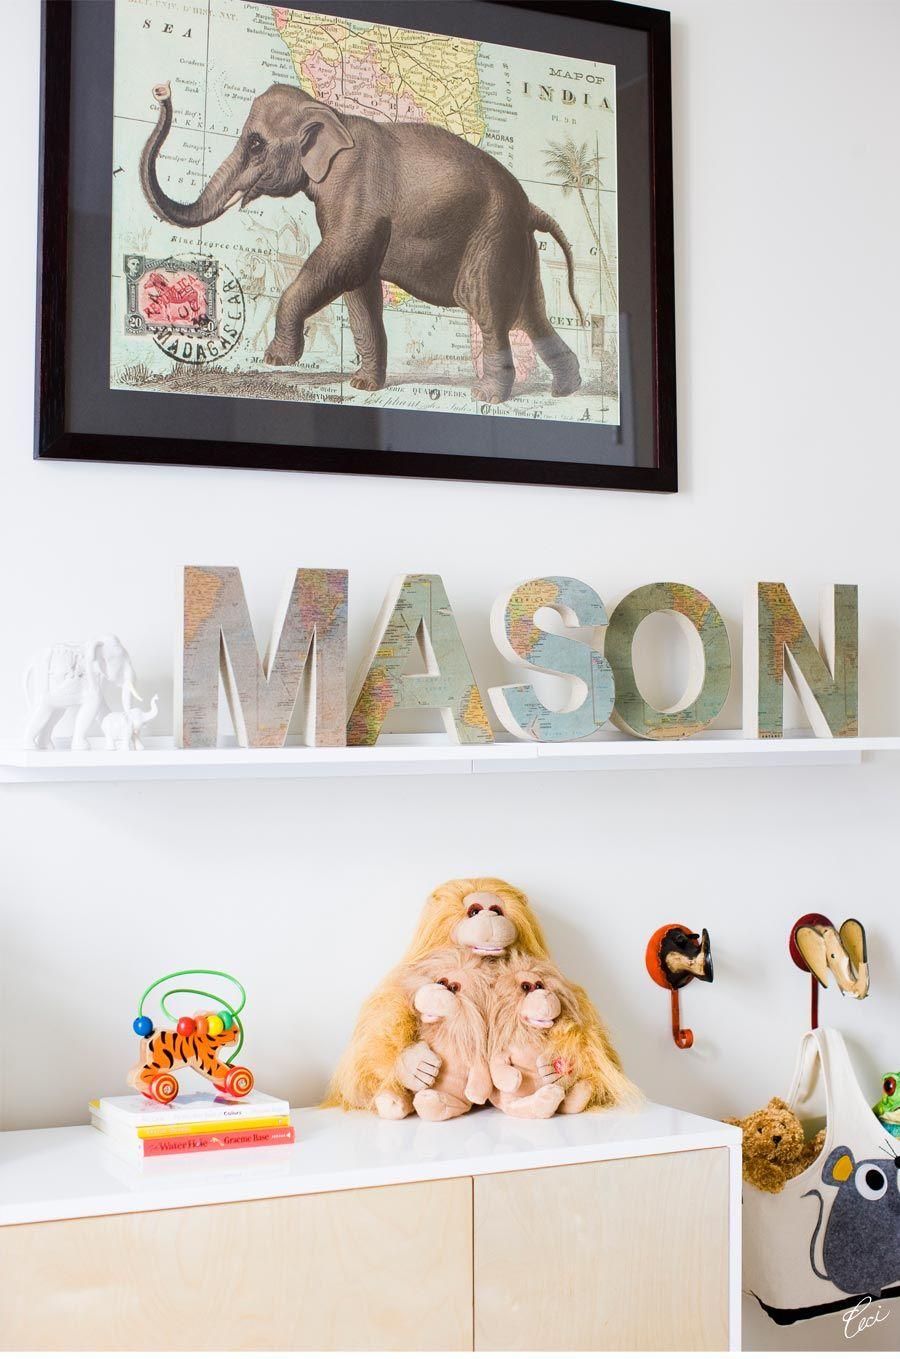 The Making of Ceci Johnsons Baby Nursery - Step 5: The Final Nursery